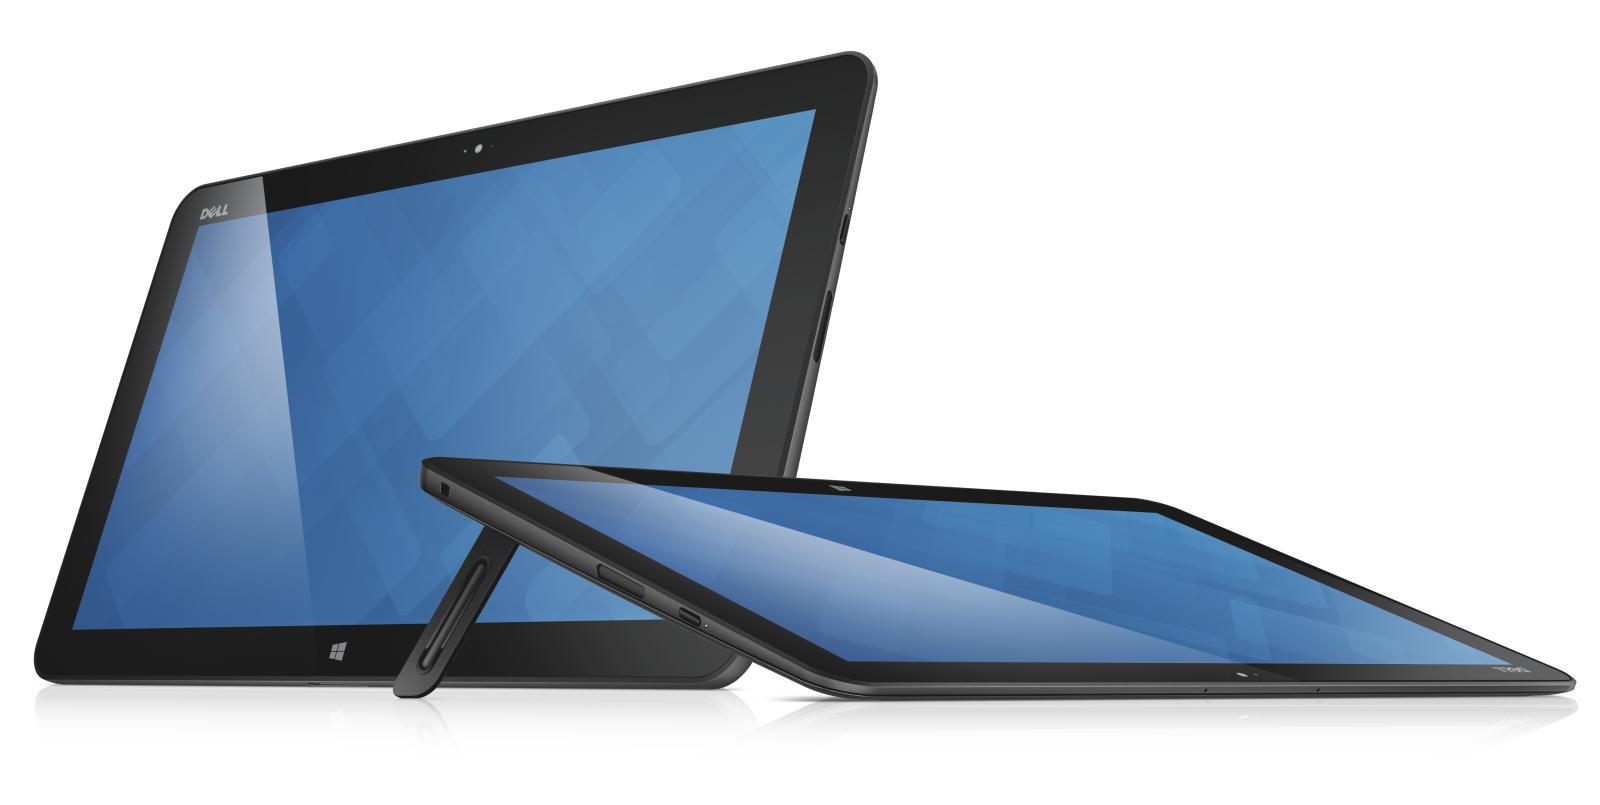 моноблок который похож на планшет - DELL XPS 18